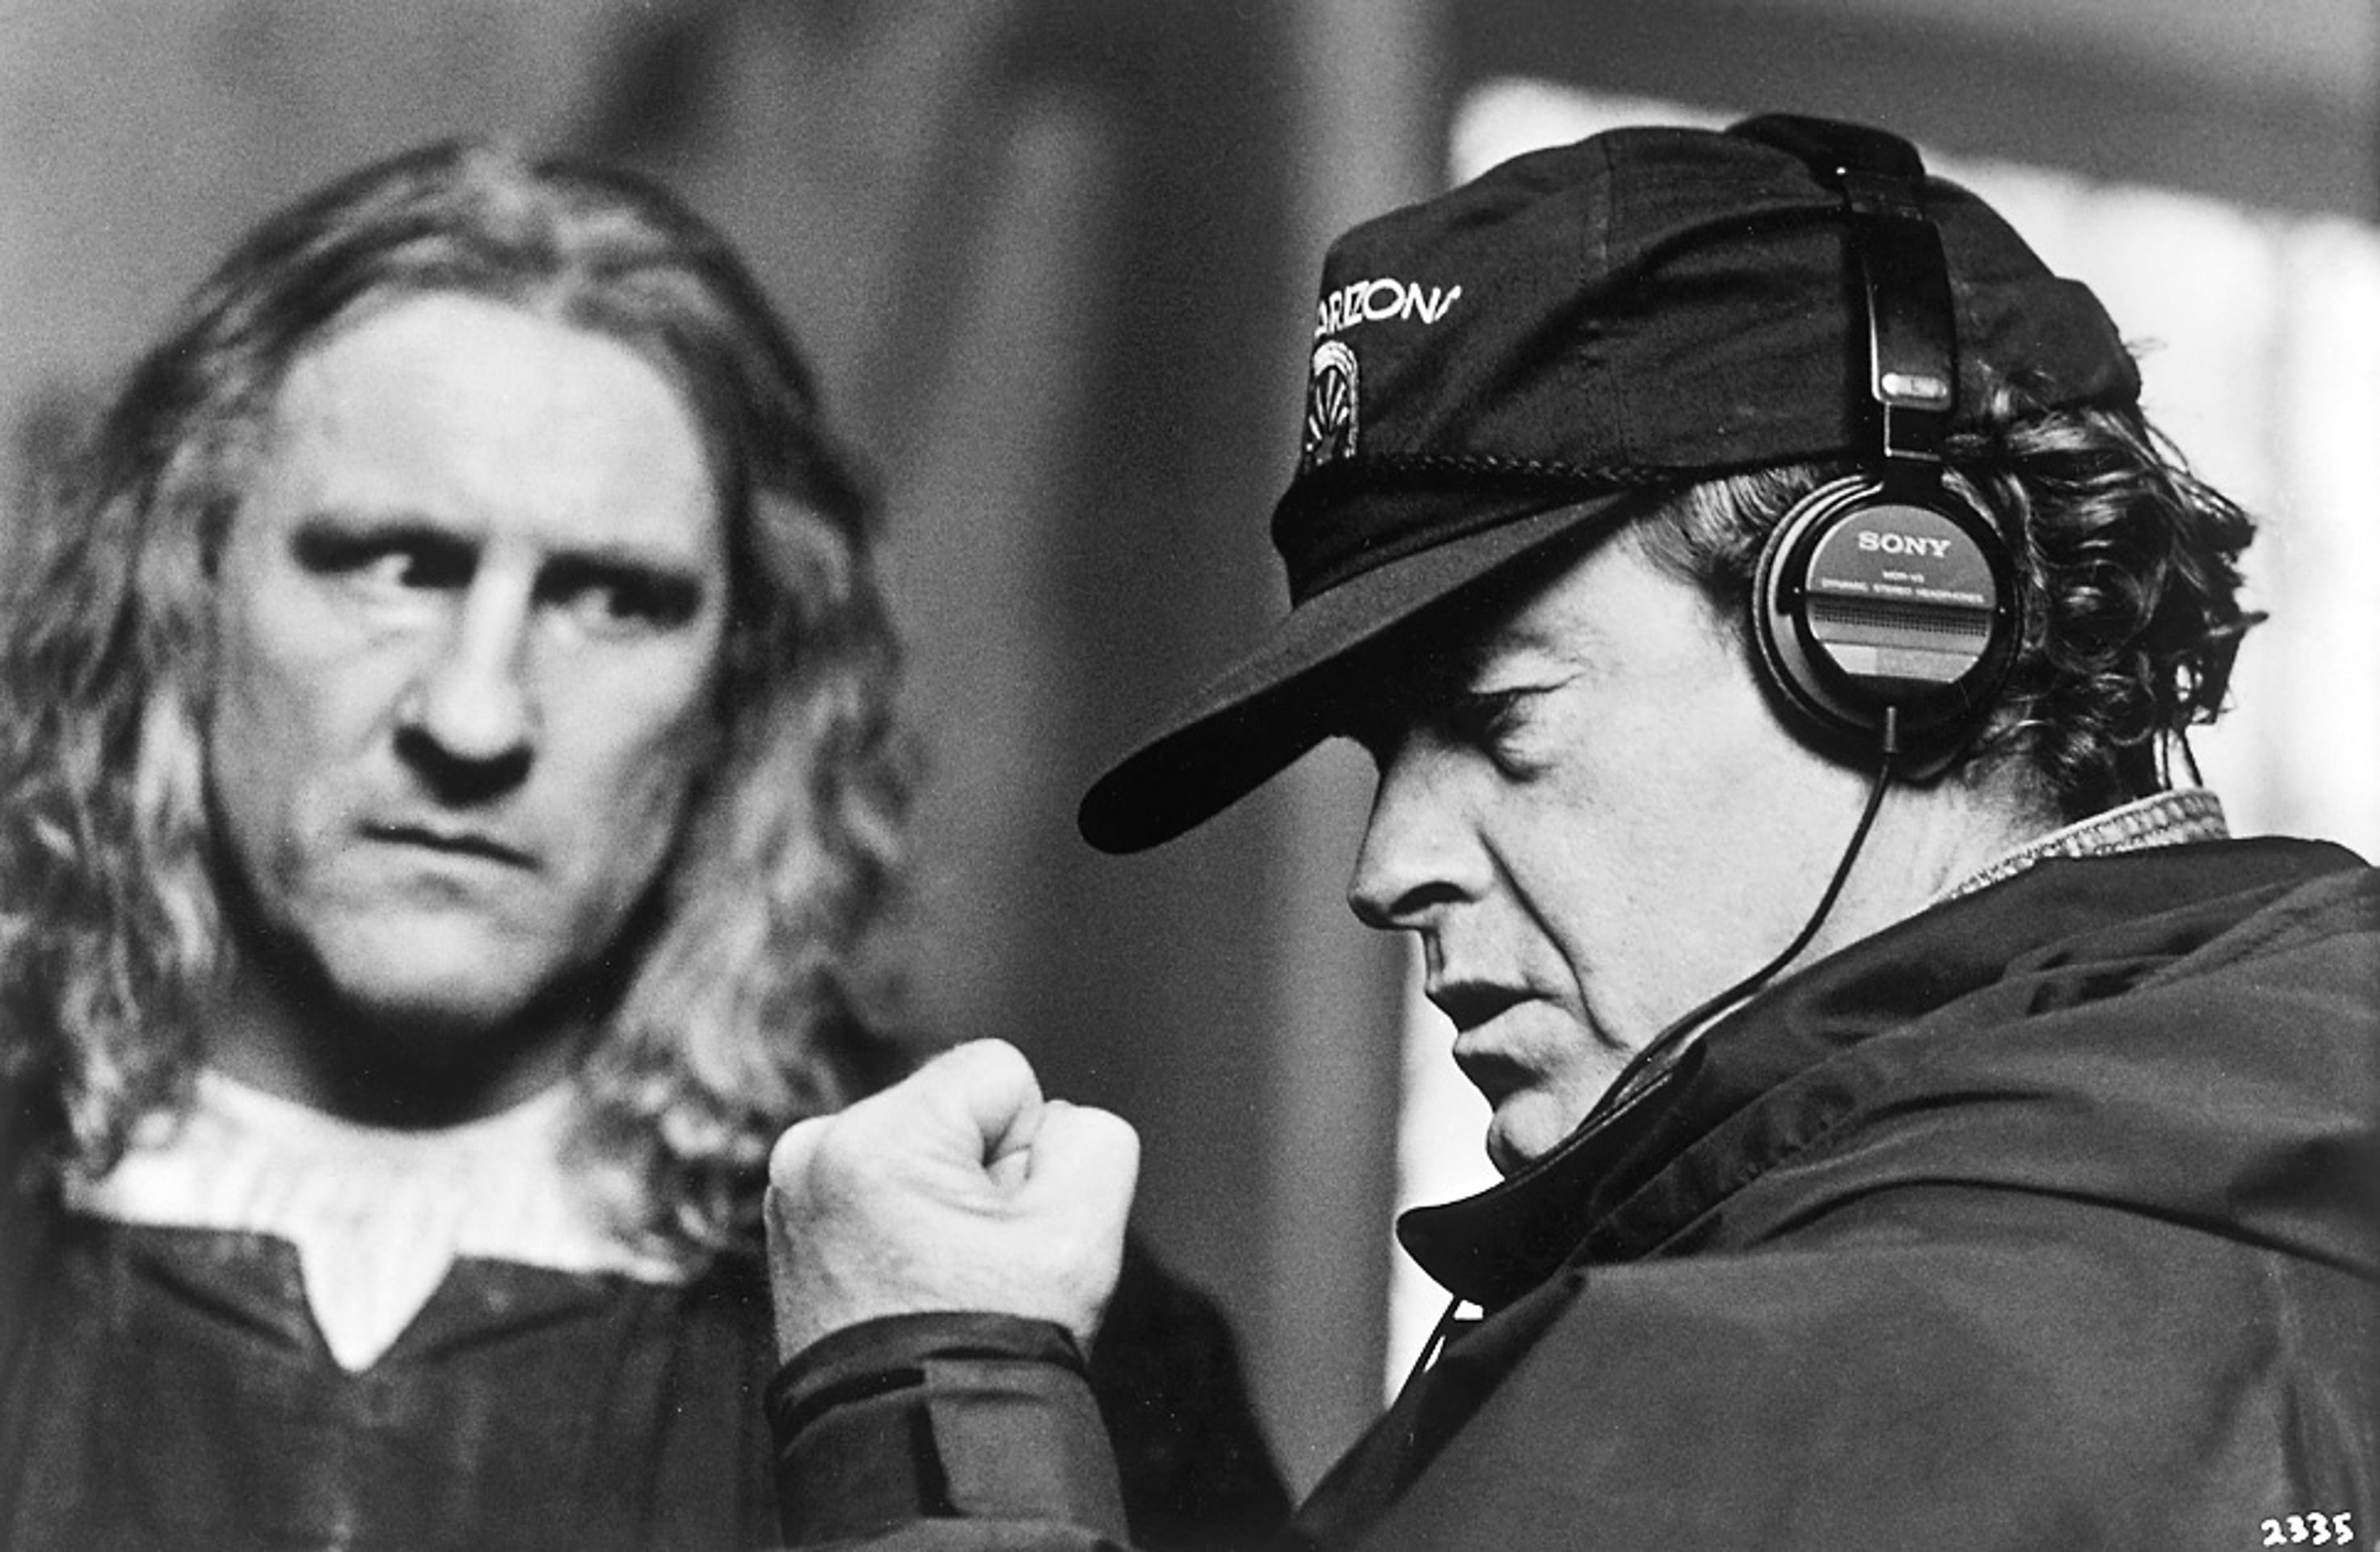 gerard depardieu as christopher columbus reacts to director ridley